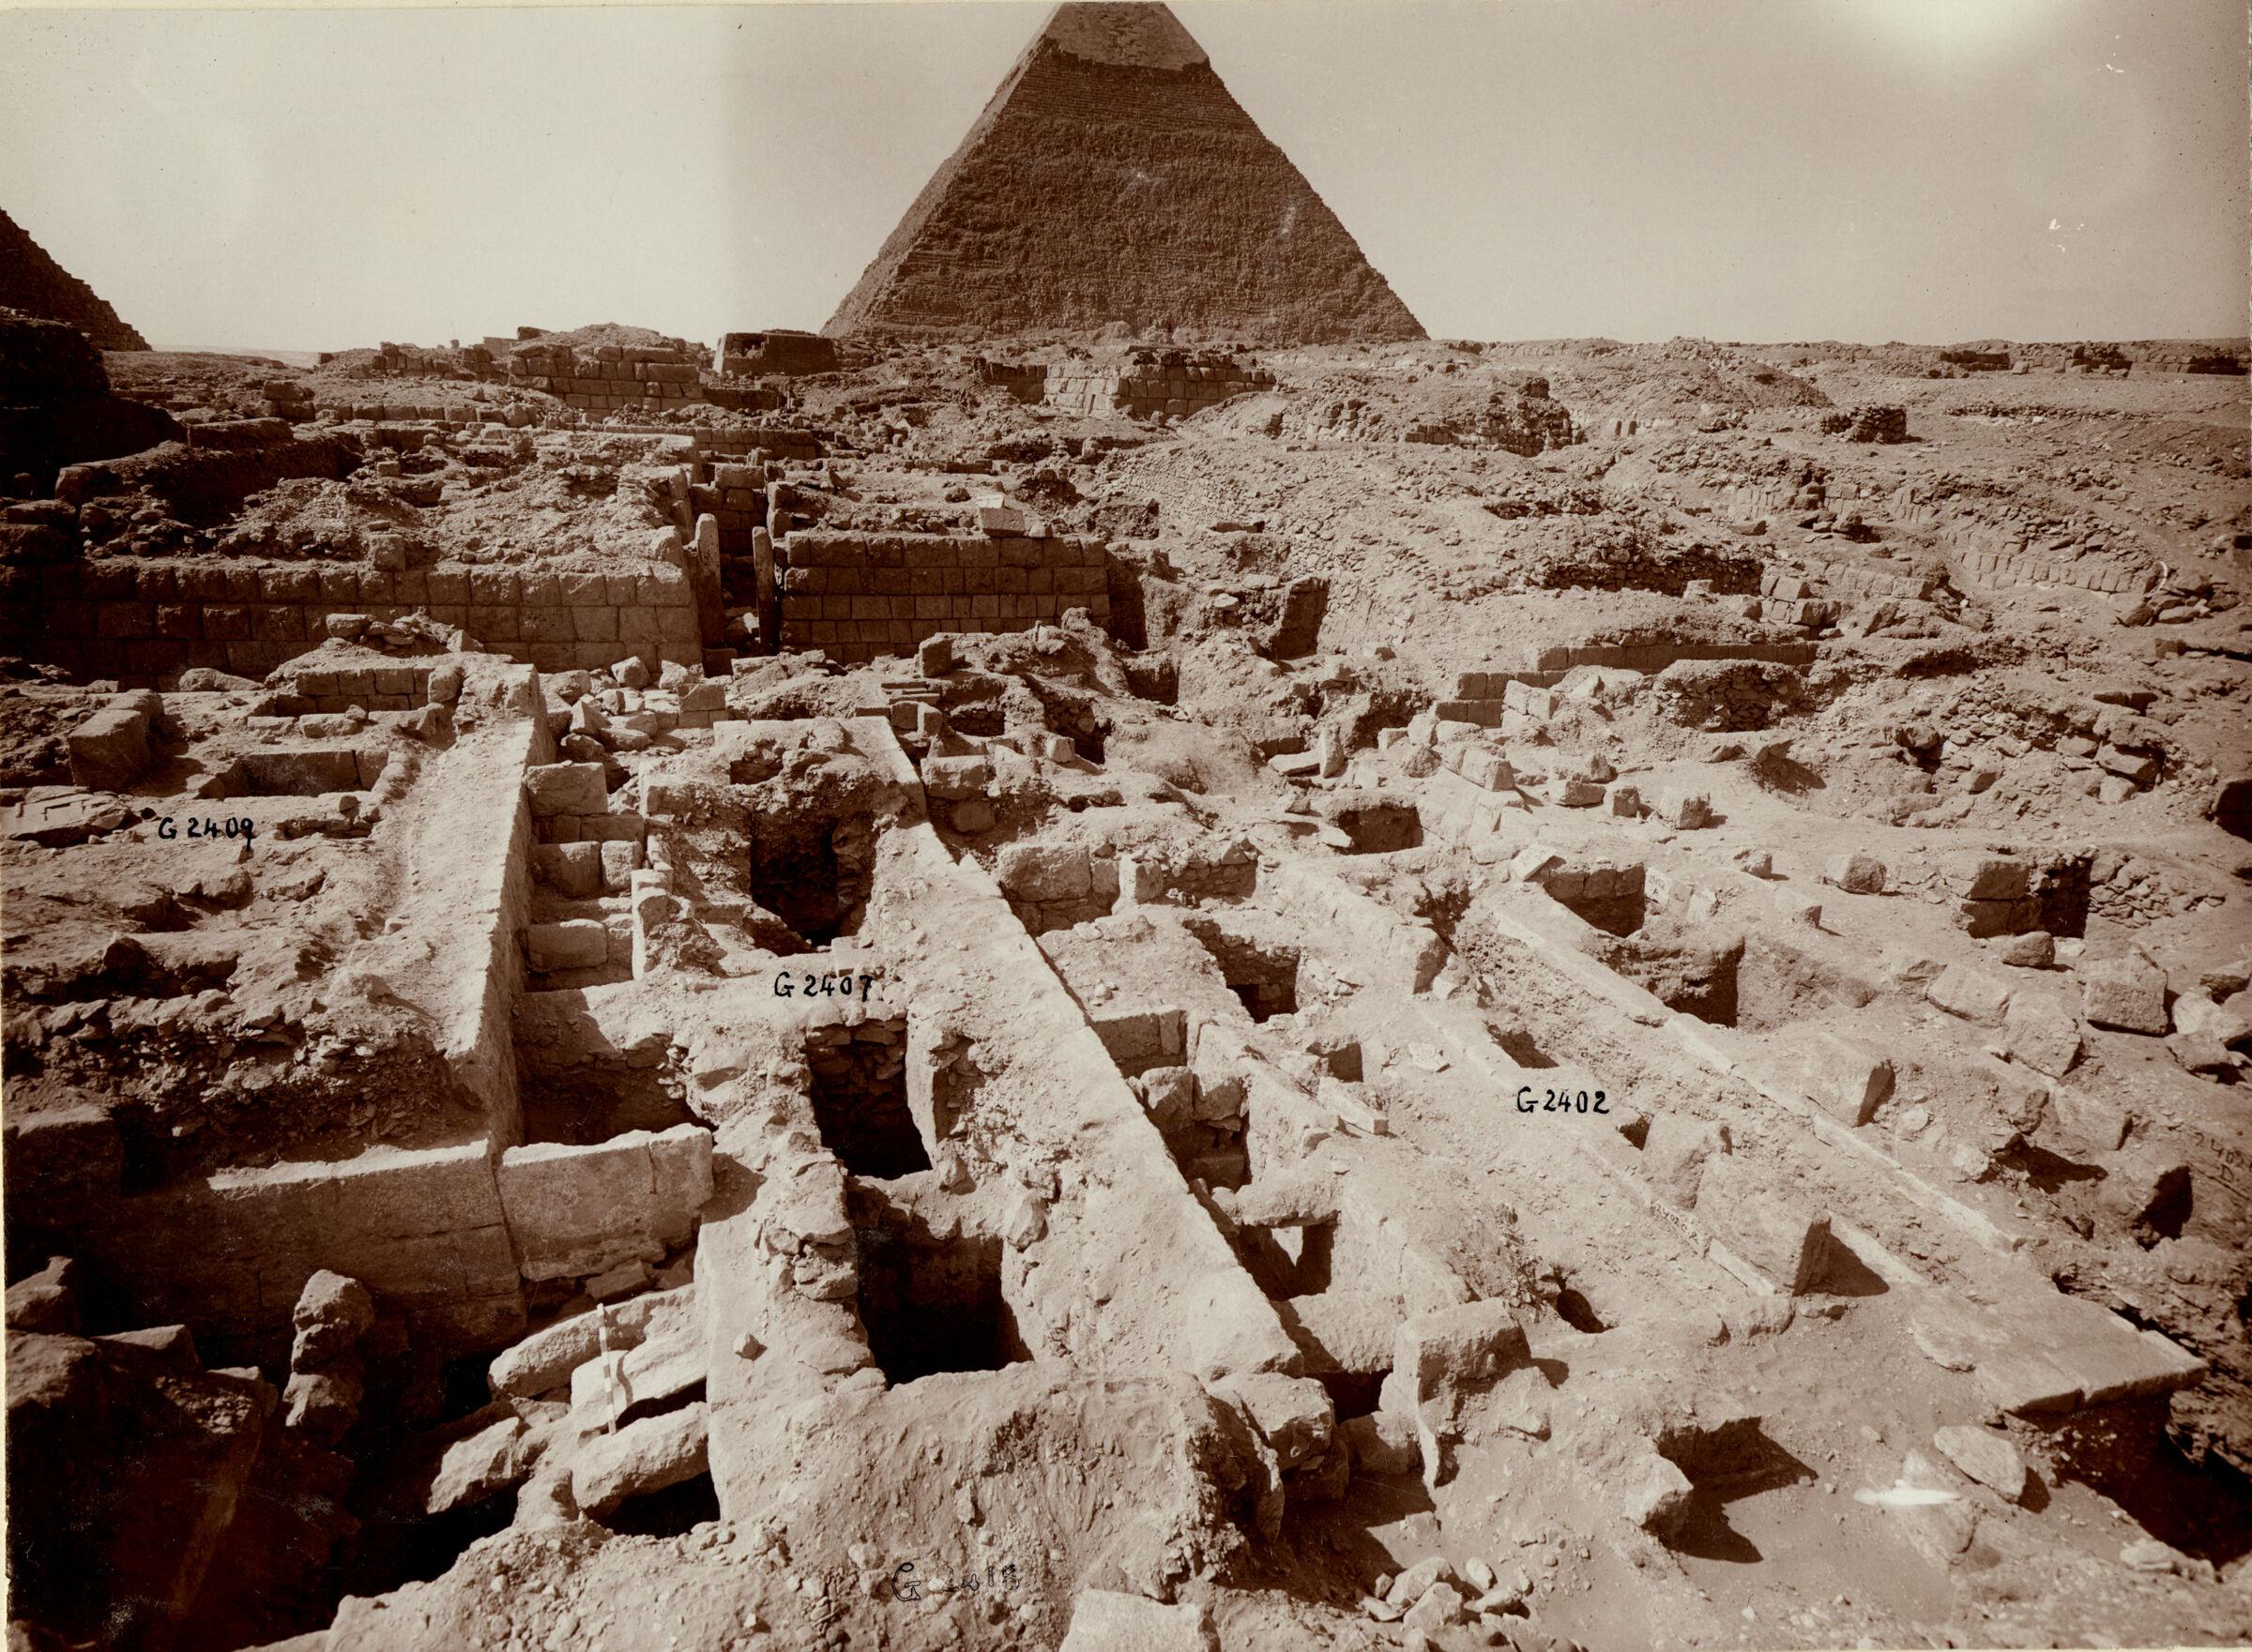 Western Cemetery: Site: Giza; View: G 2407, G 2402, G 2409, G 2360, G 2353